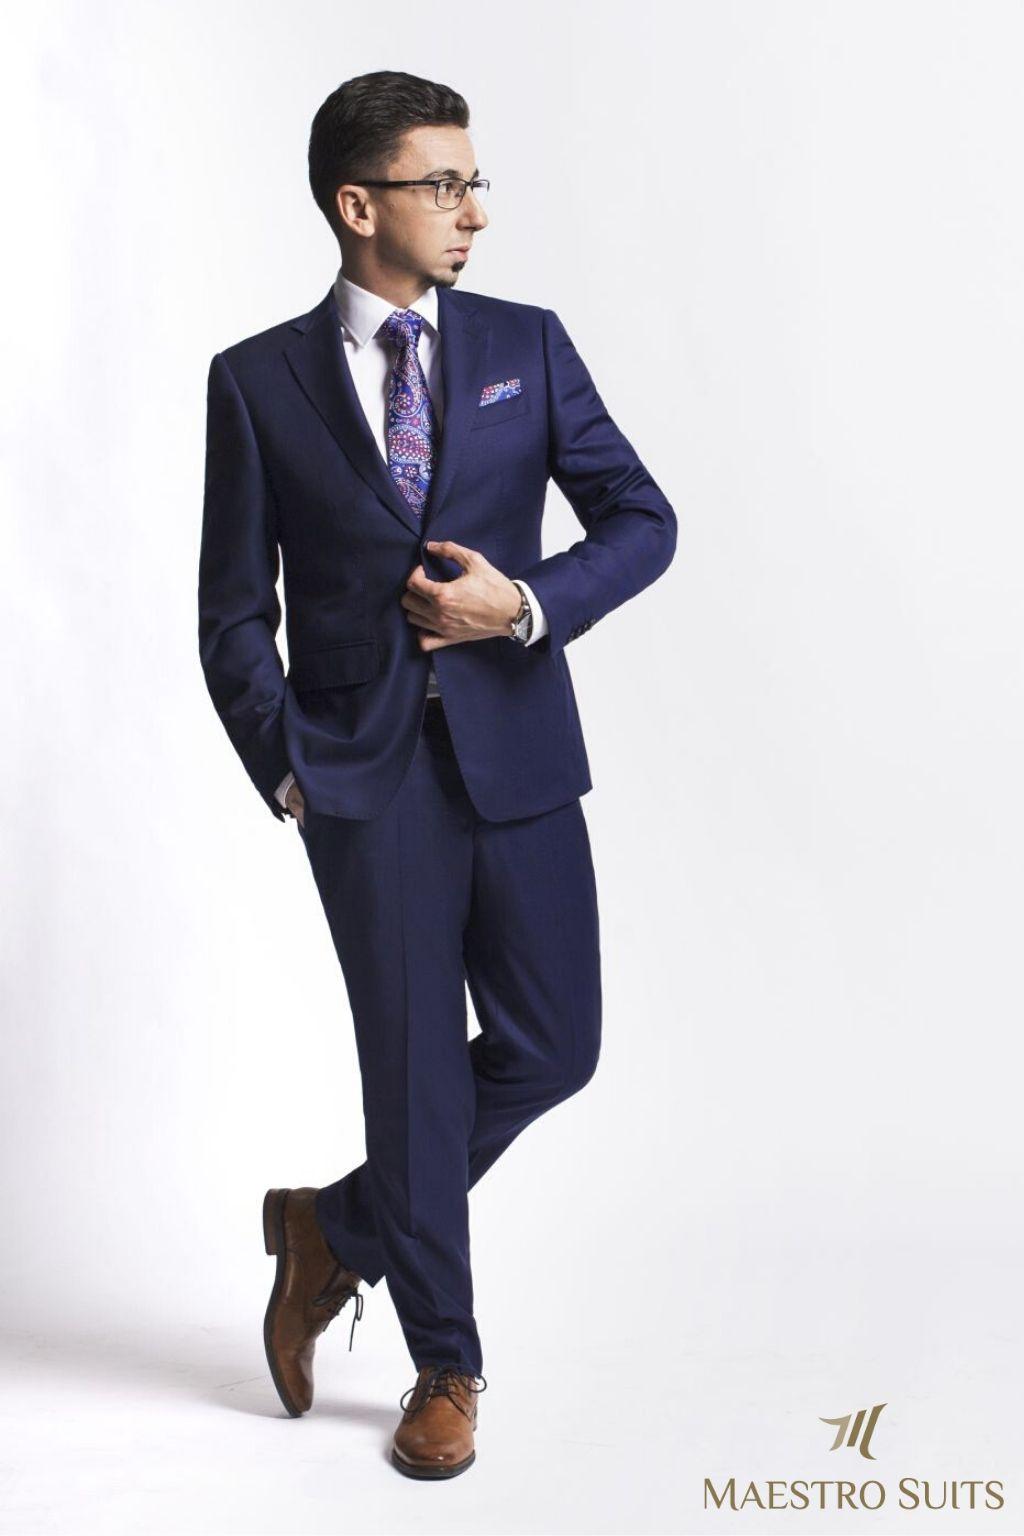 zvonko_komsic_maestro_suits (5)